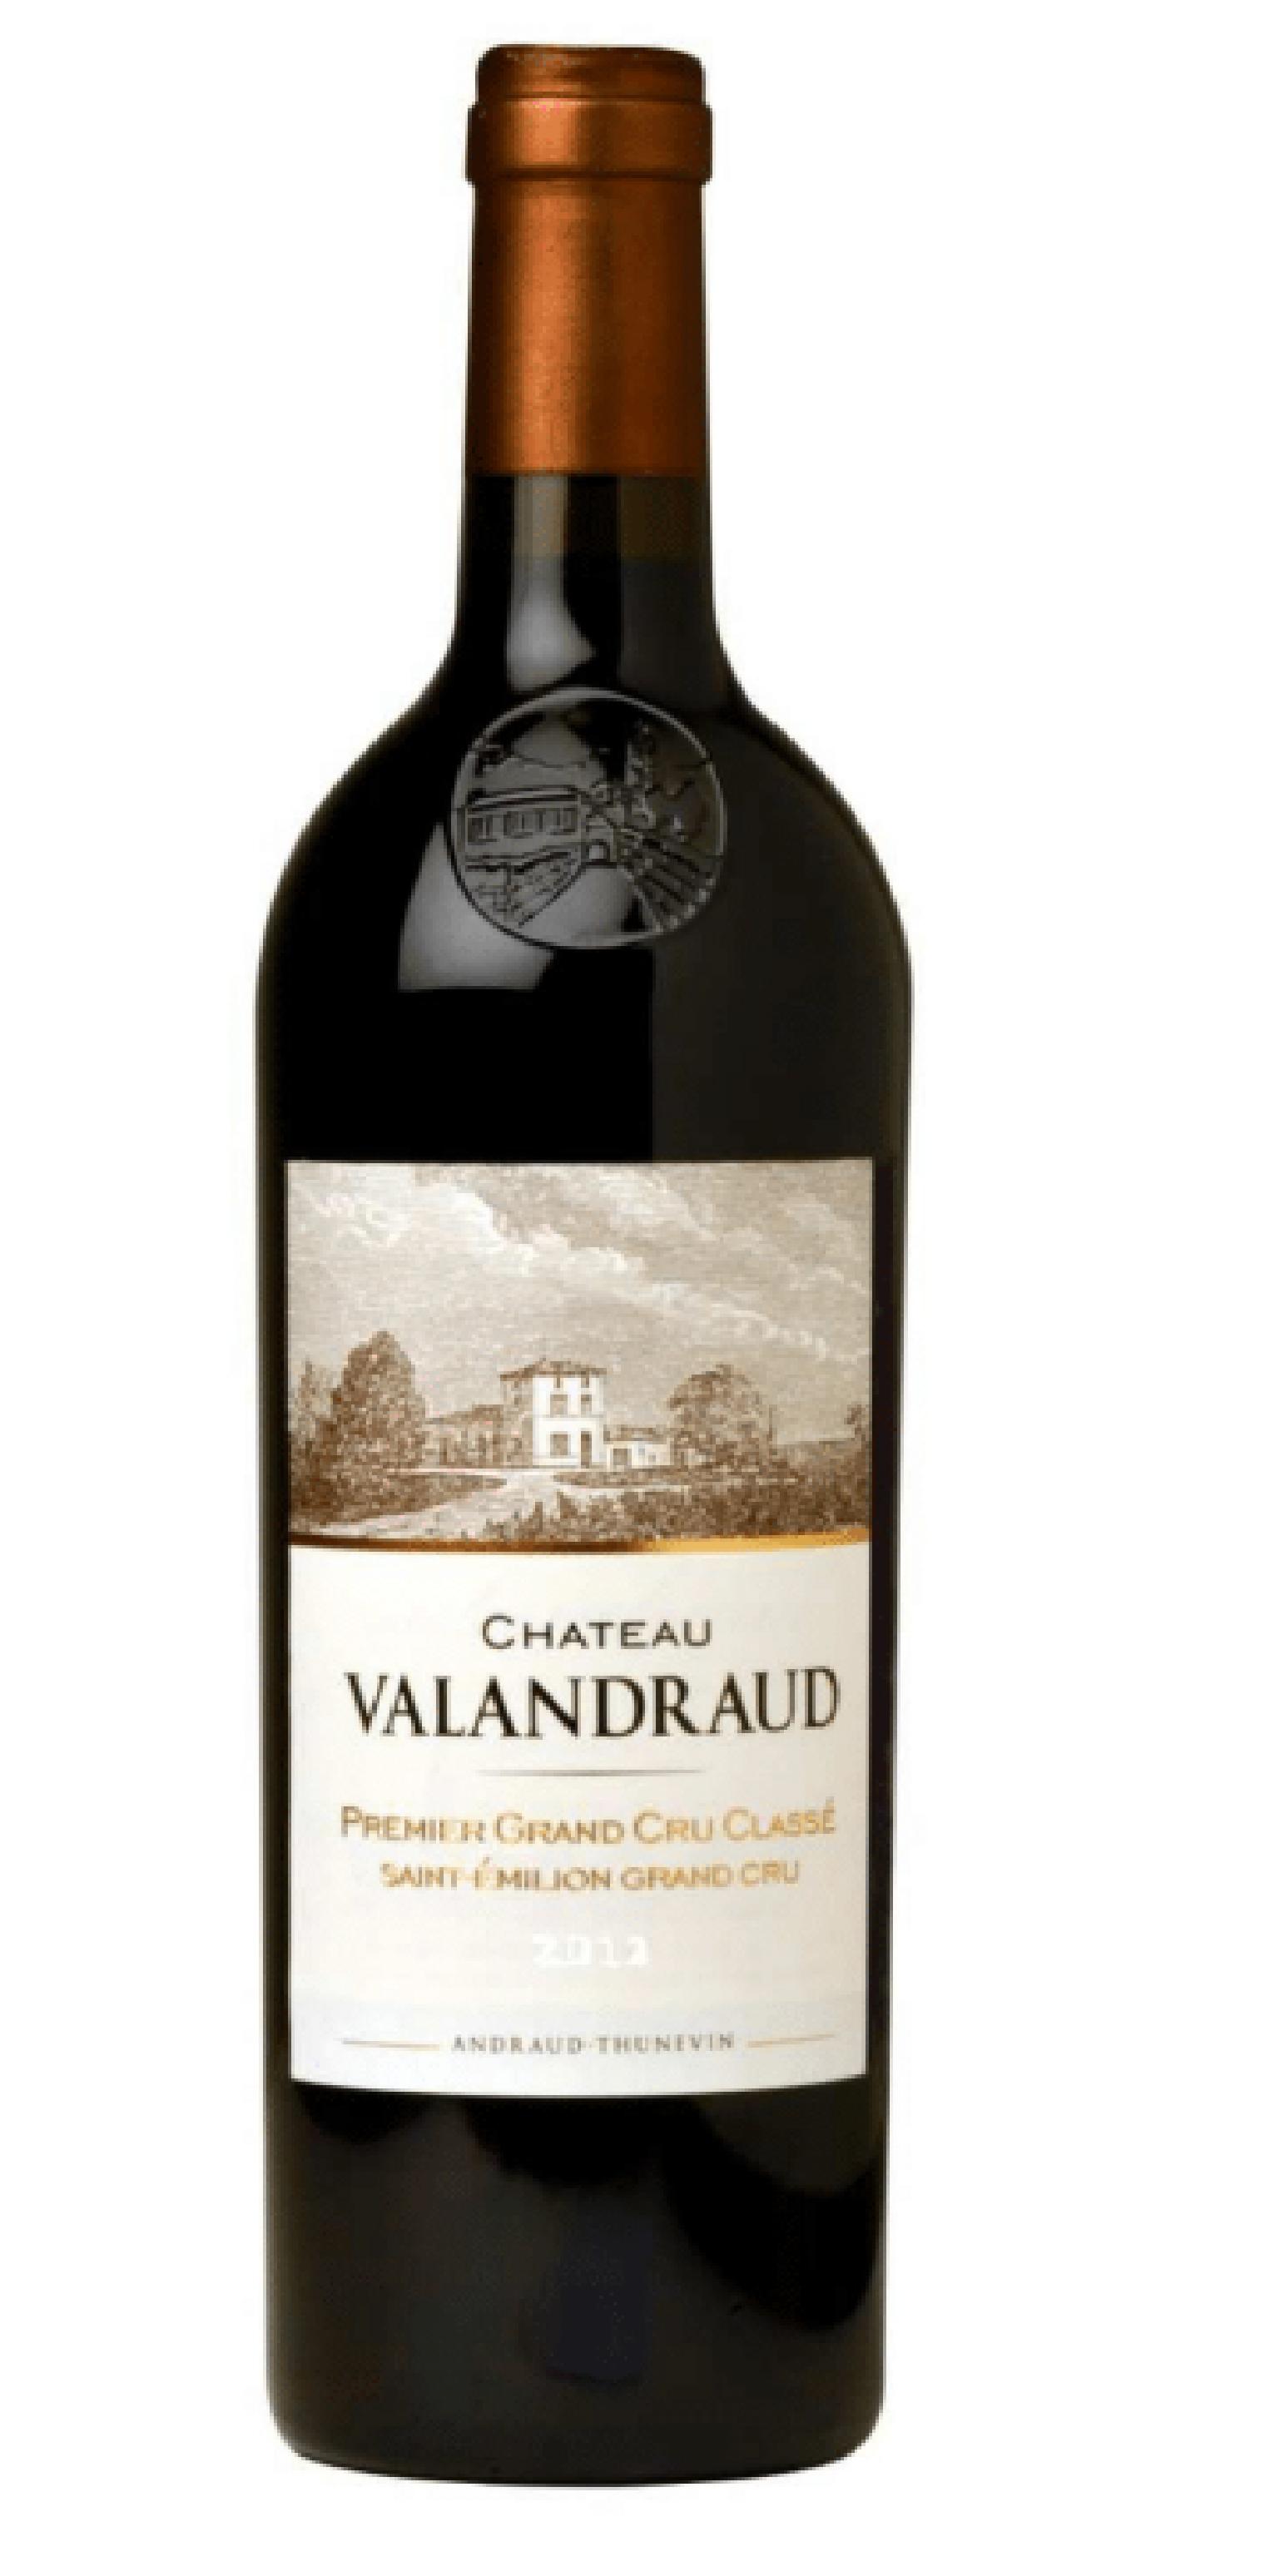 Château Valandraud, 1er grand cru classé B